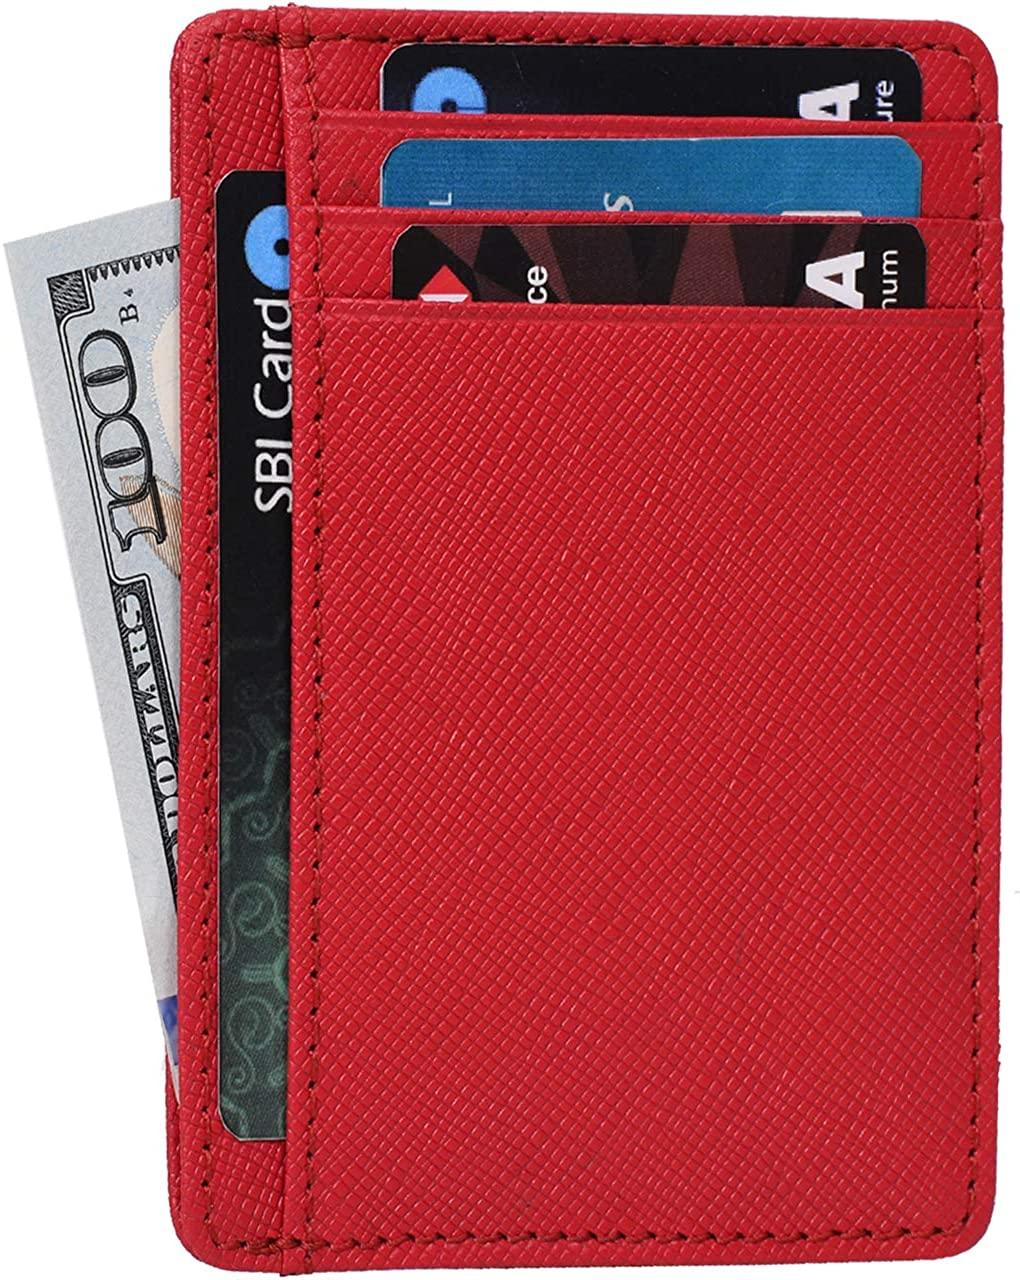 Clifton Heritage Men's RFID Wallet